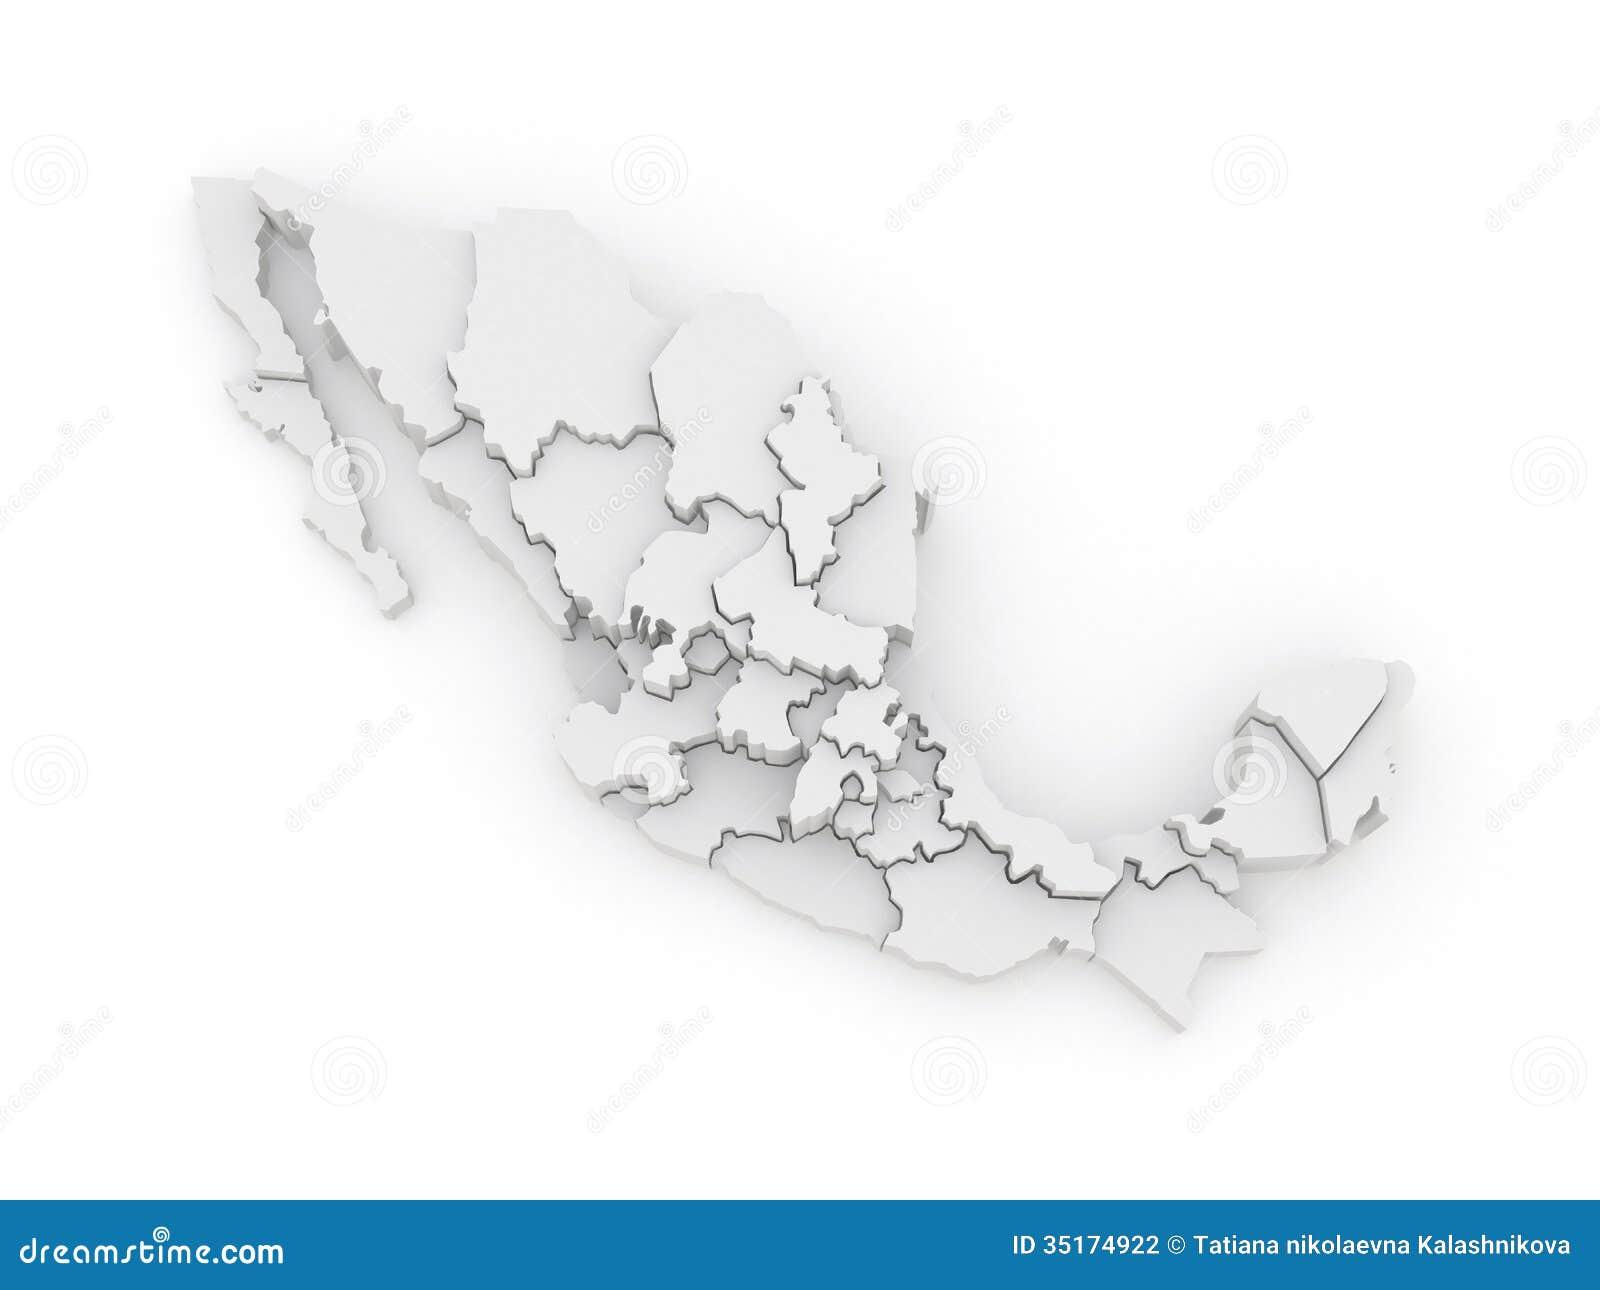 Icono Mapa Mexico Png: Mapa Tridimensional De México Stock De Ilustración